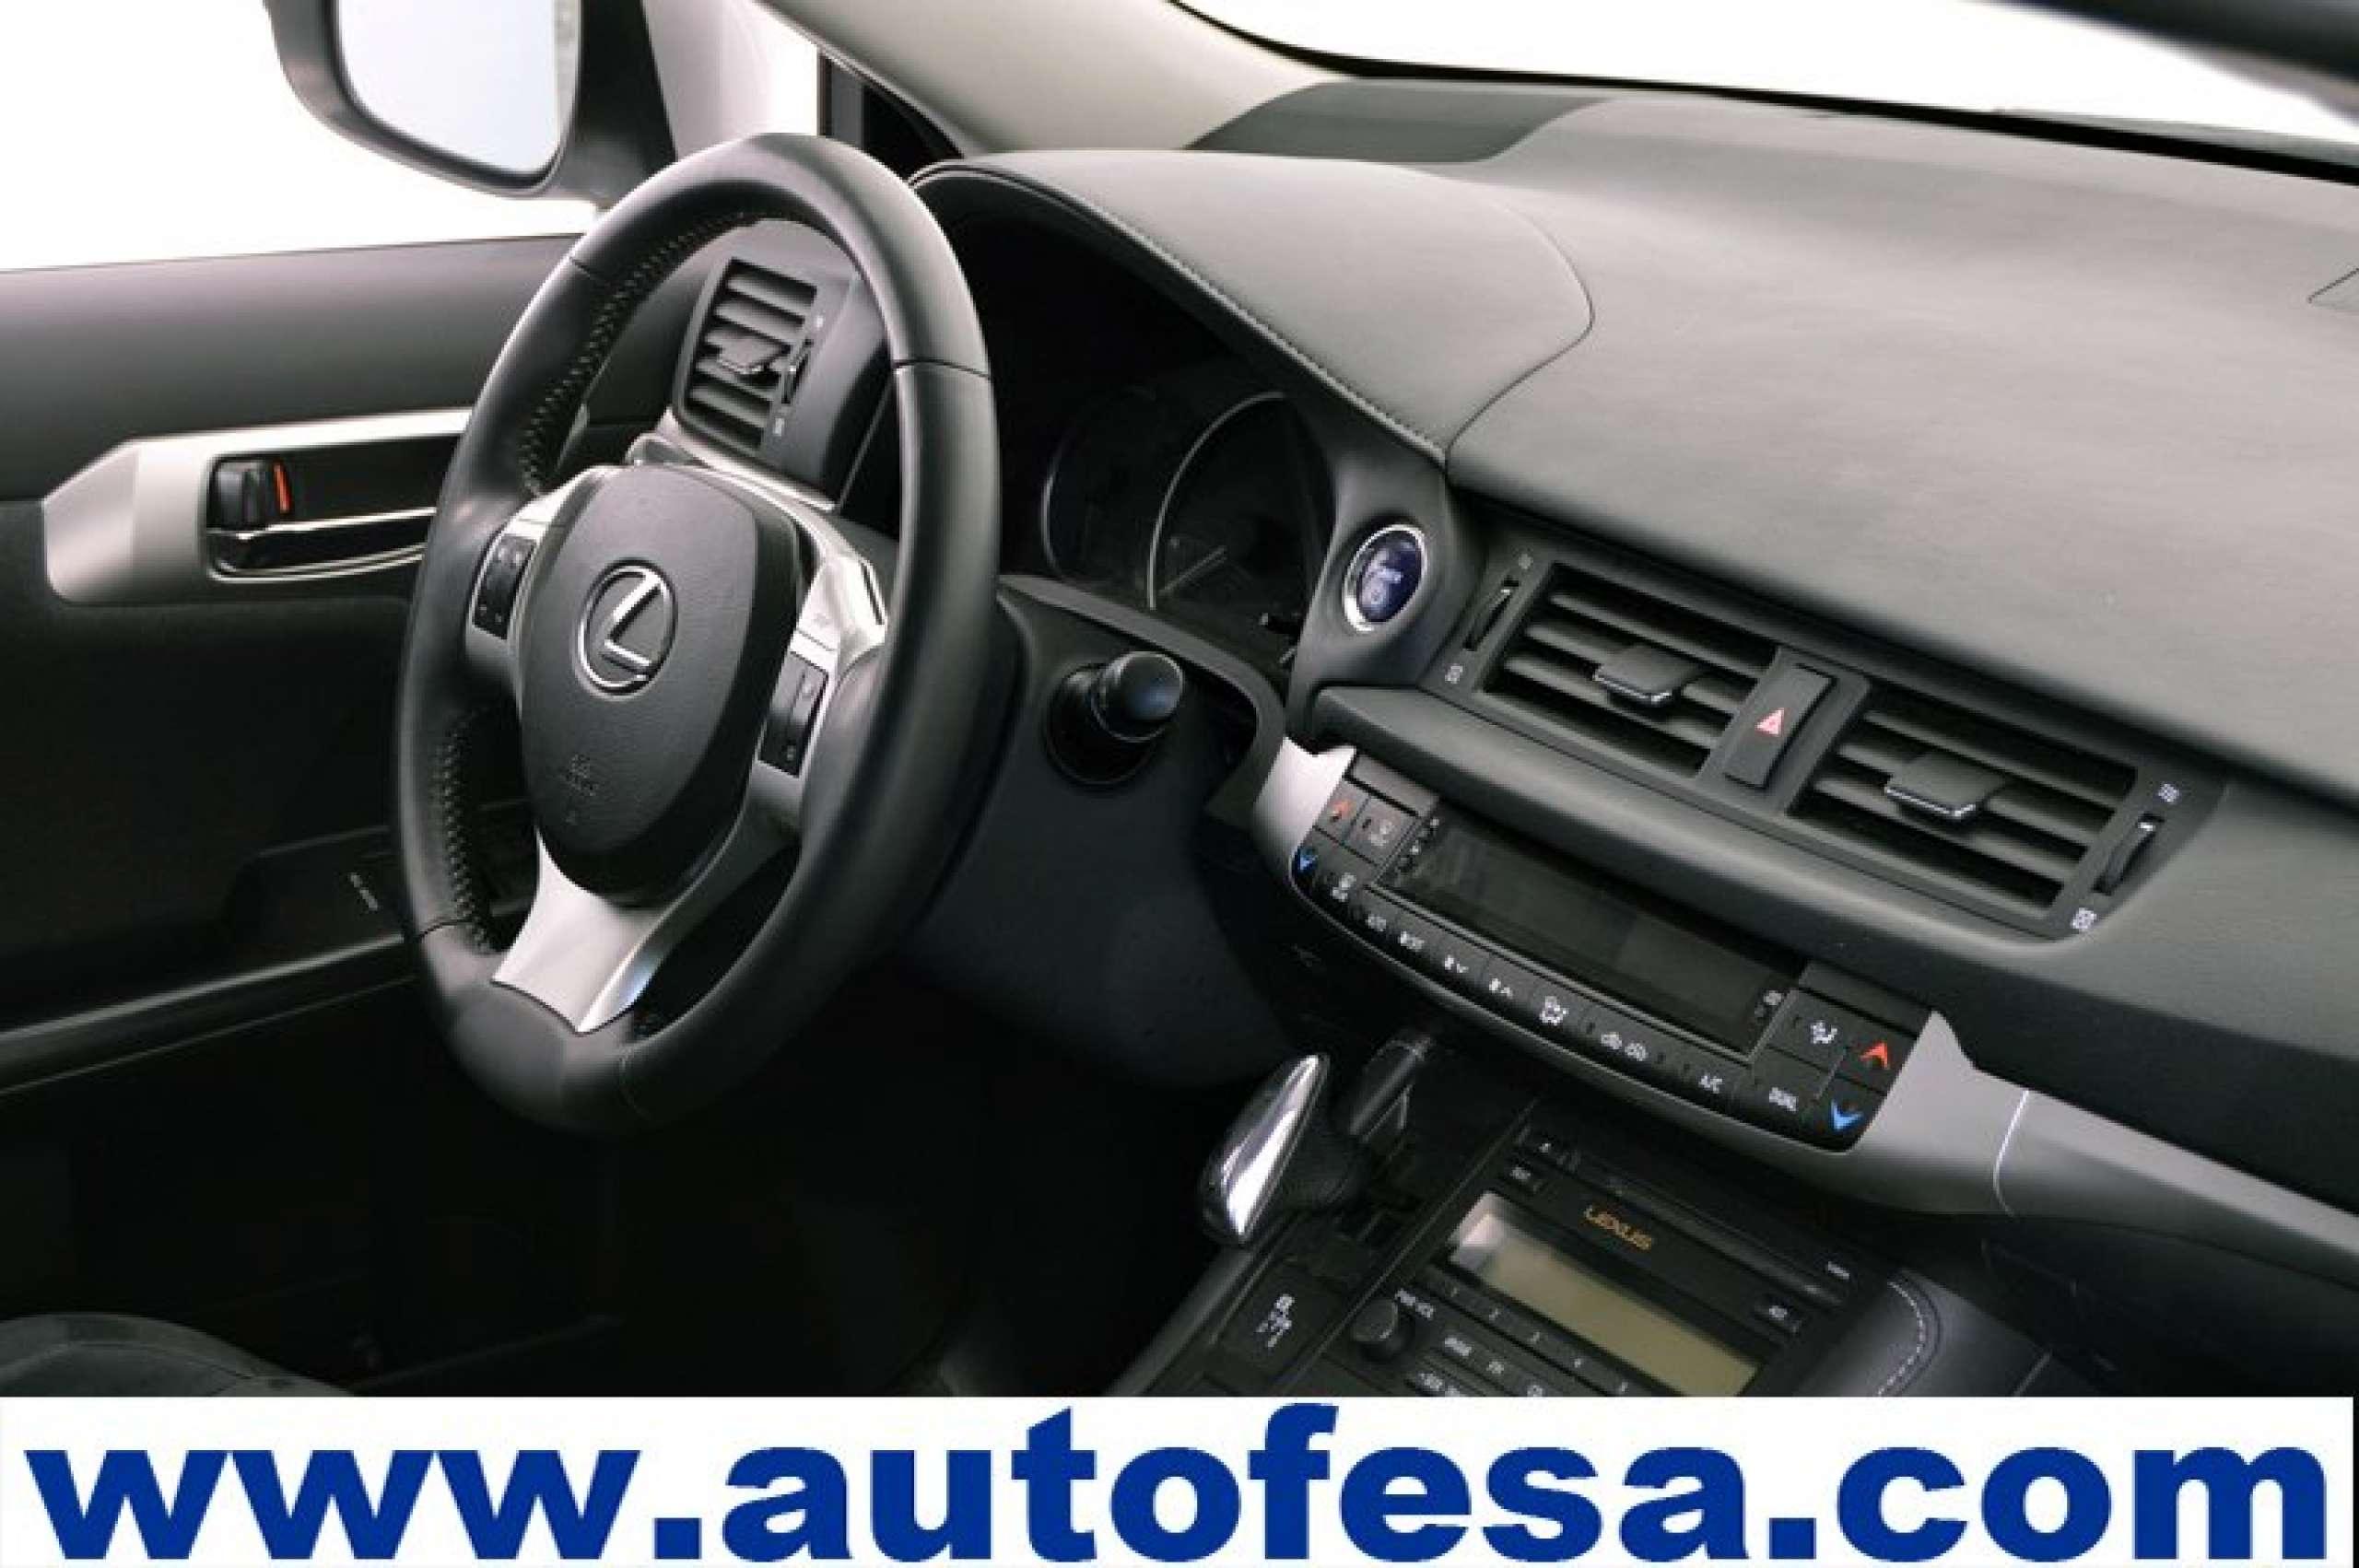 Lexus Ct 200h 1.8 136cv Eco Auto 5p - Foto 19